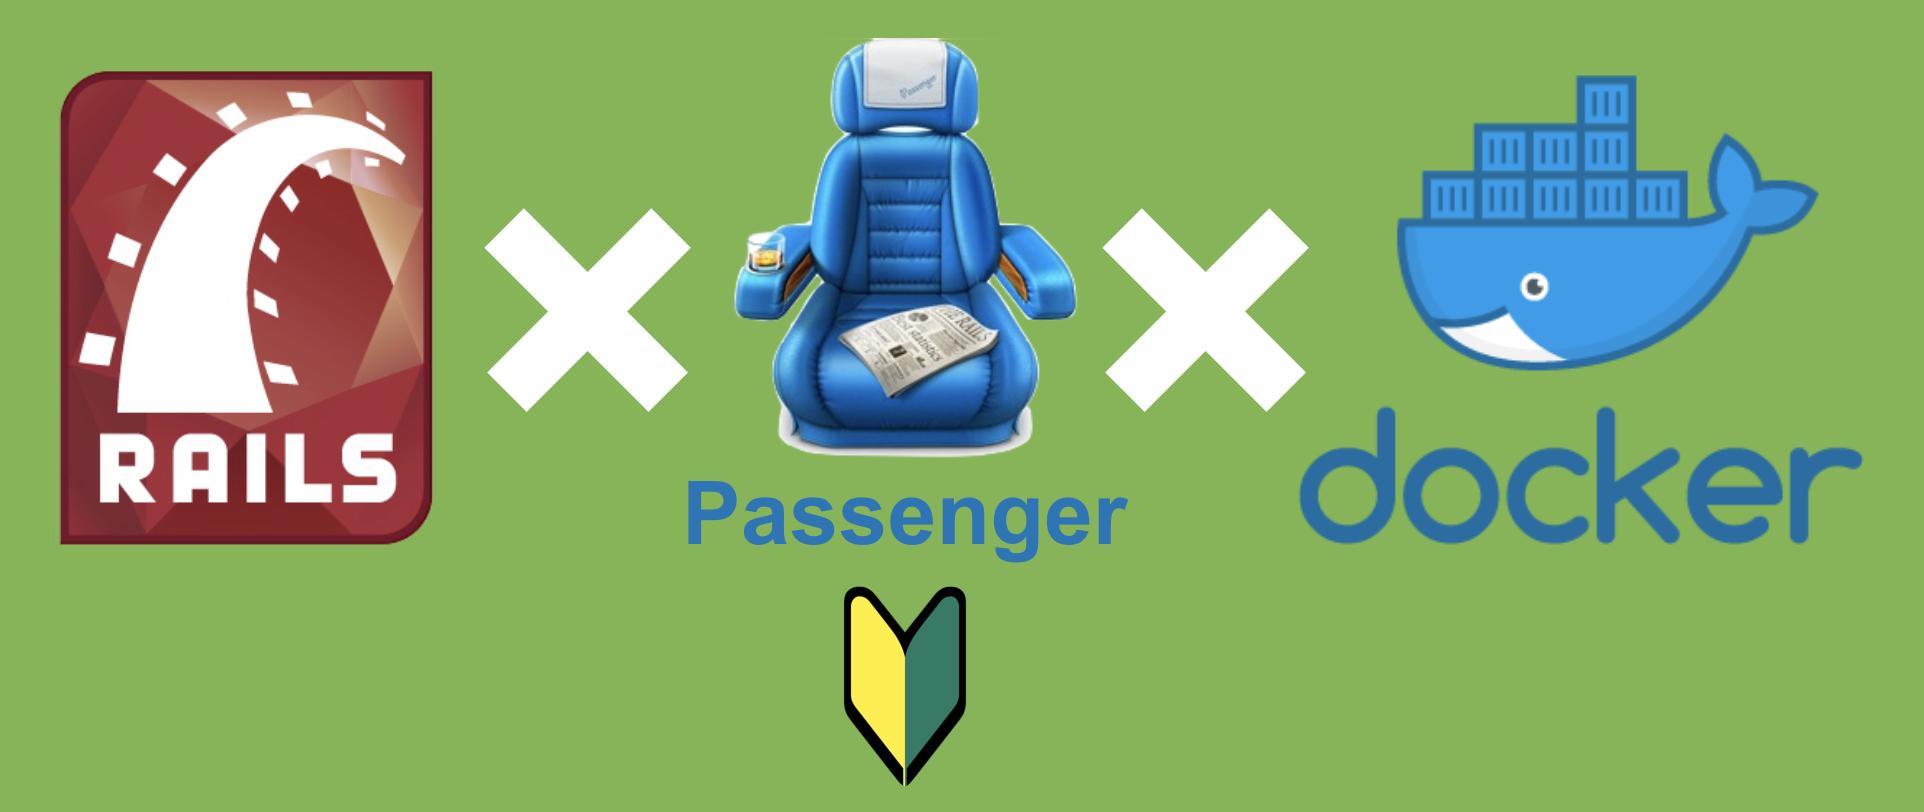 passenger-rails.png